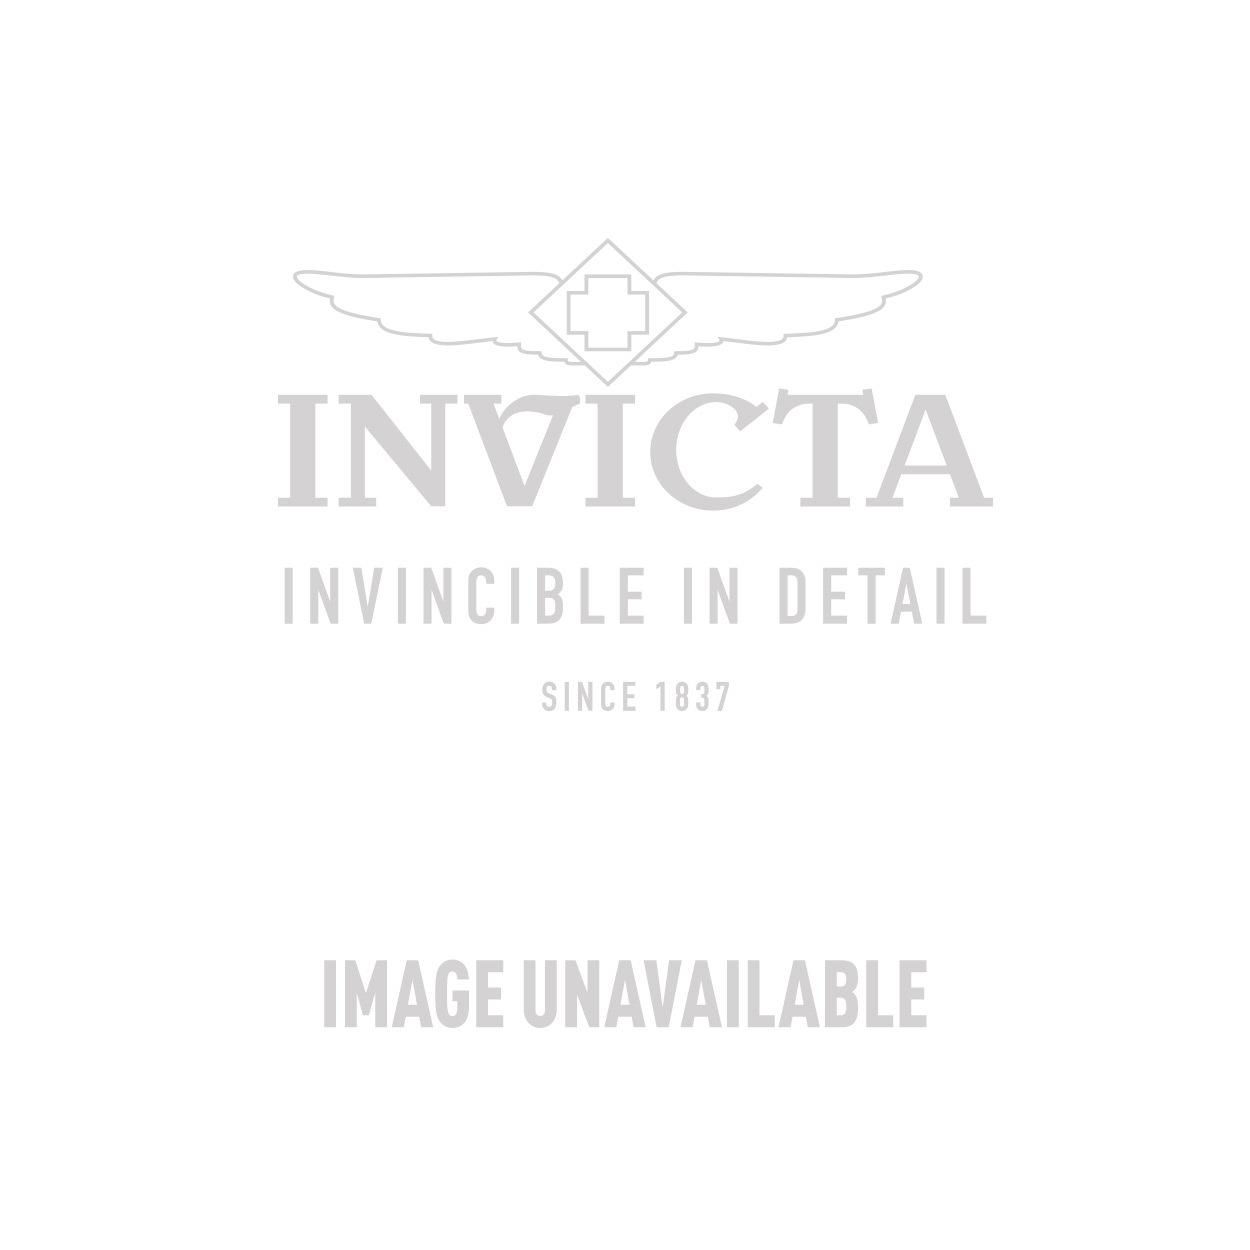 Invicta Russian Diver Swiss Movement Quartz Watch - Black case with Olive Green tone Polyurethane band - Model 11901